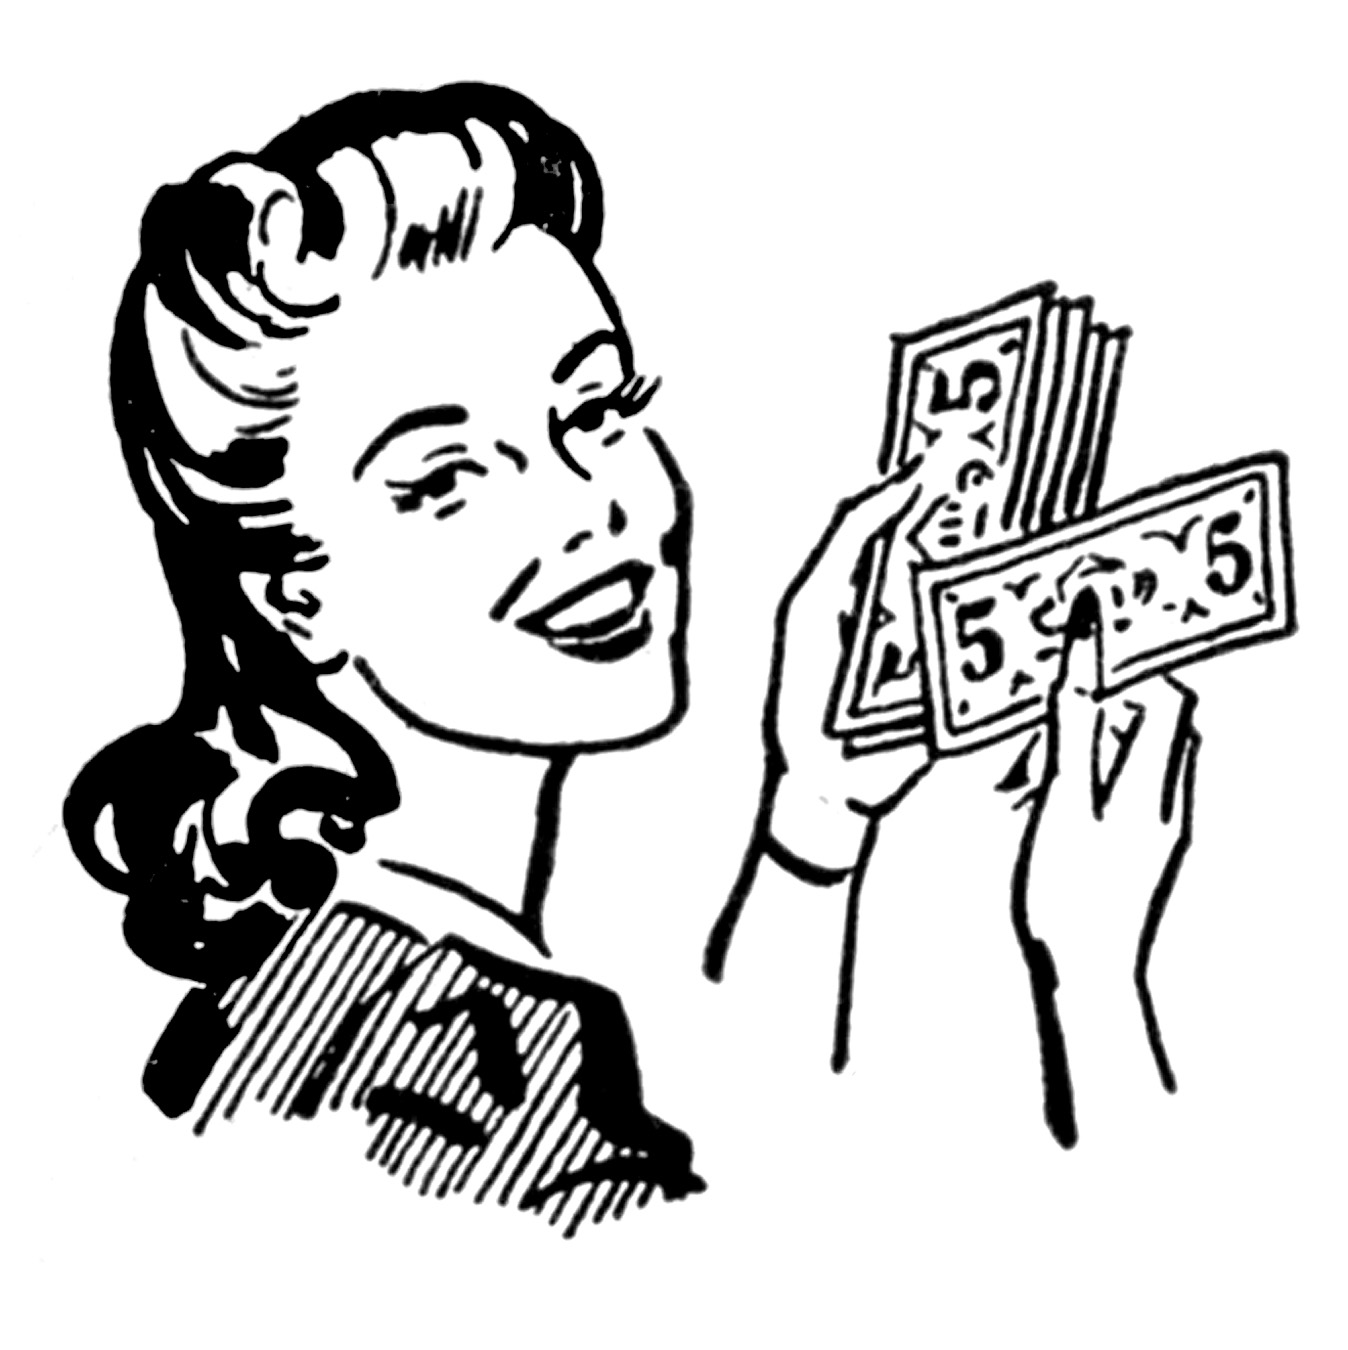 Retro Clip Art U2013 Money Moms U2013 Wo-Retro Clip Art u2013 Money Moms u2013 Women-10